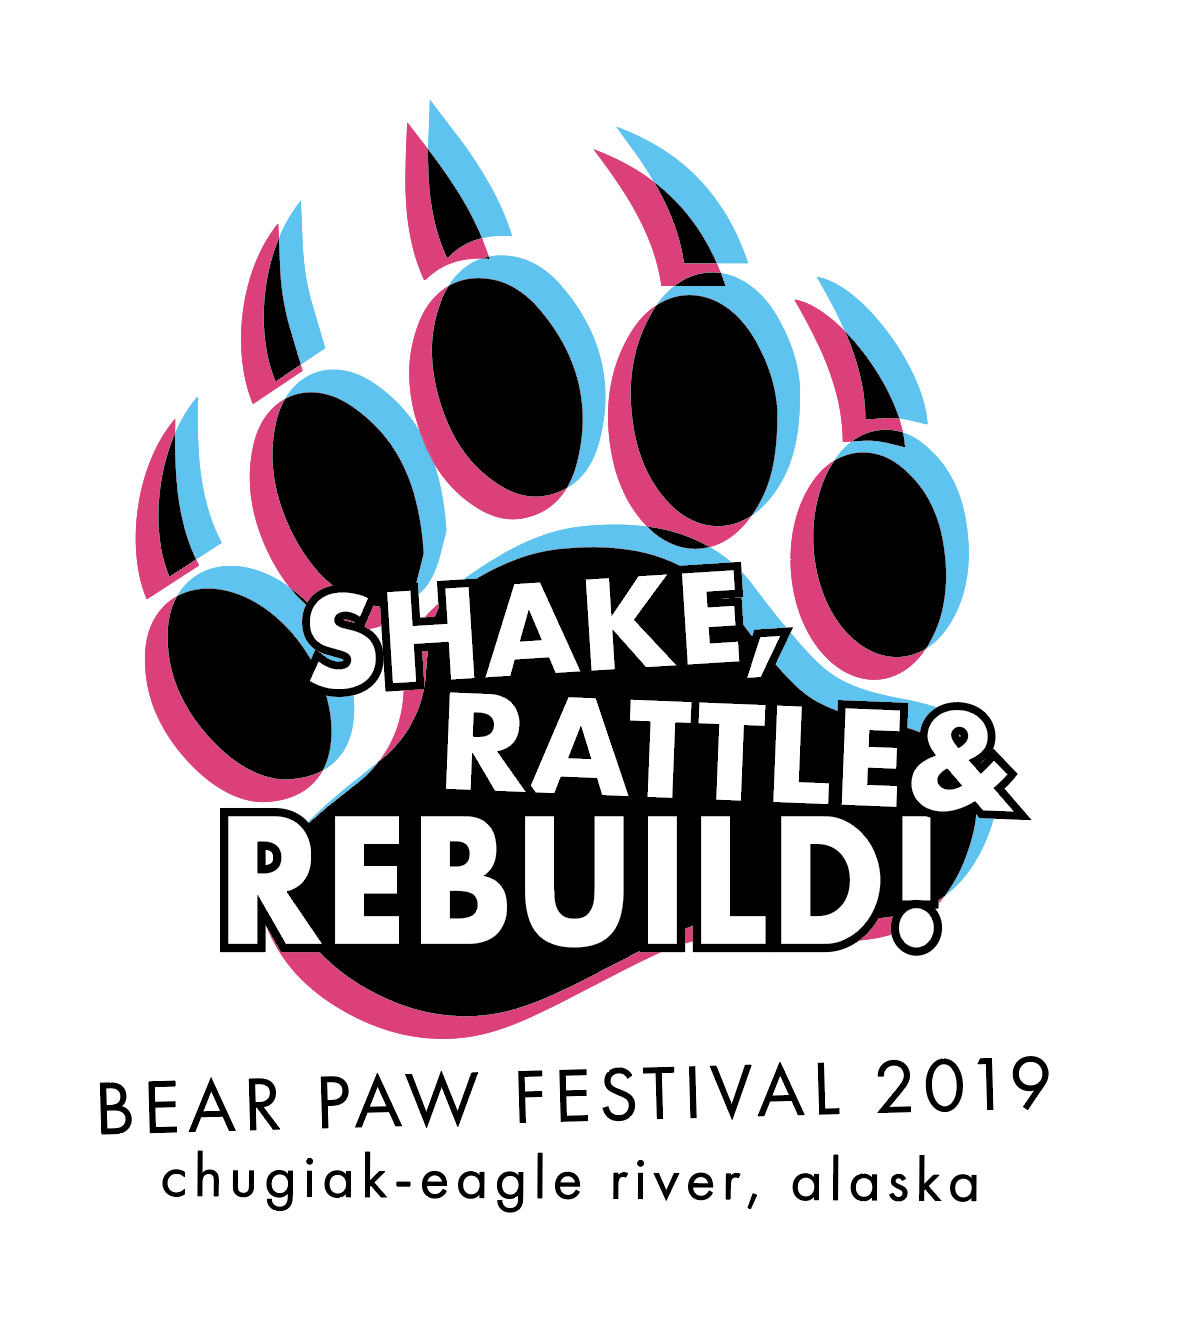 """Everything Bear Paw"" Newsletter #7"